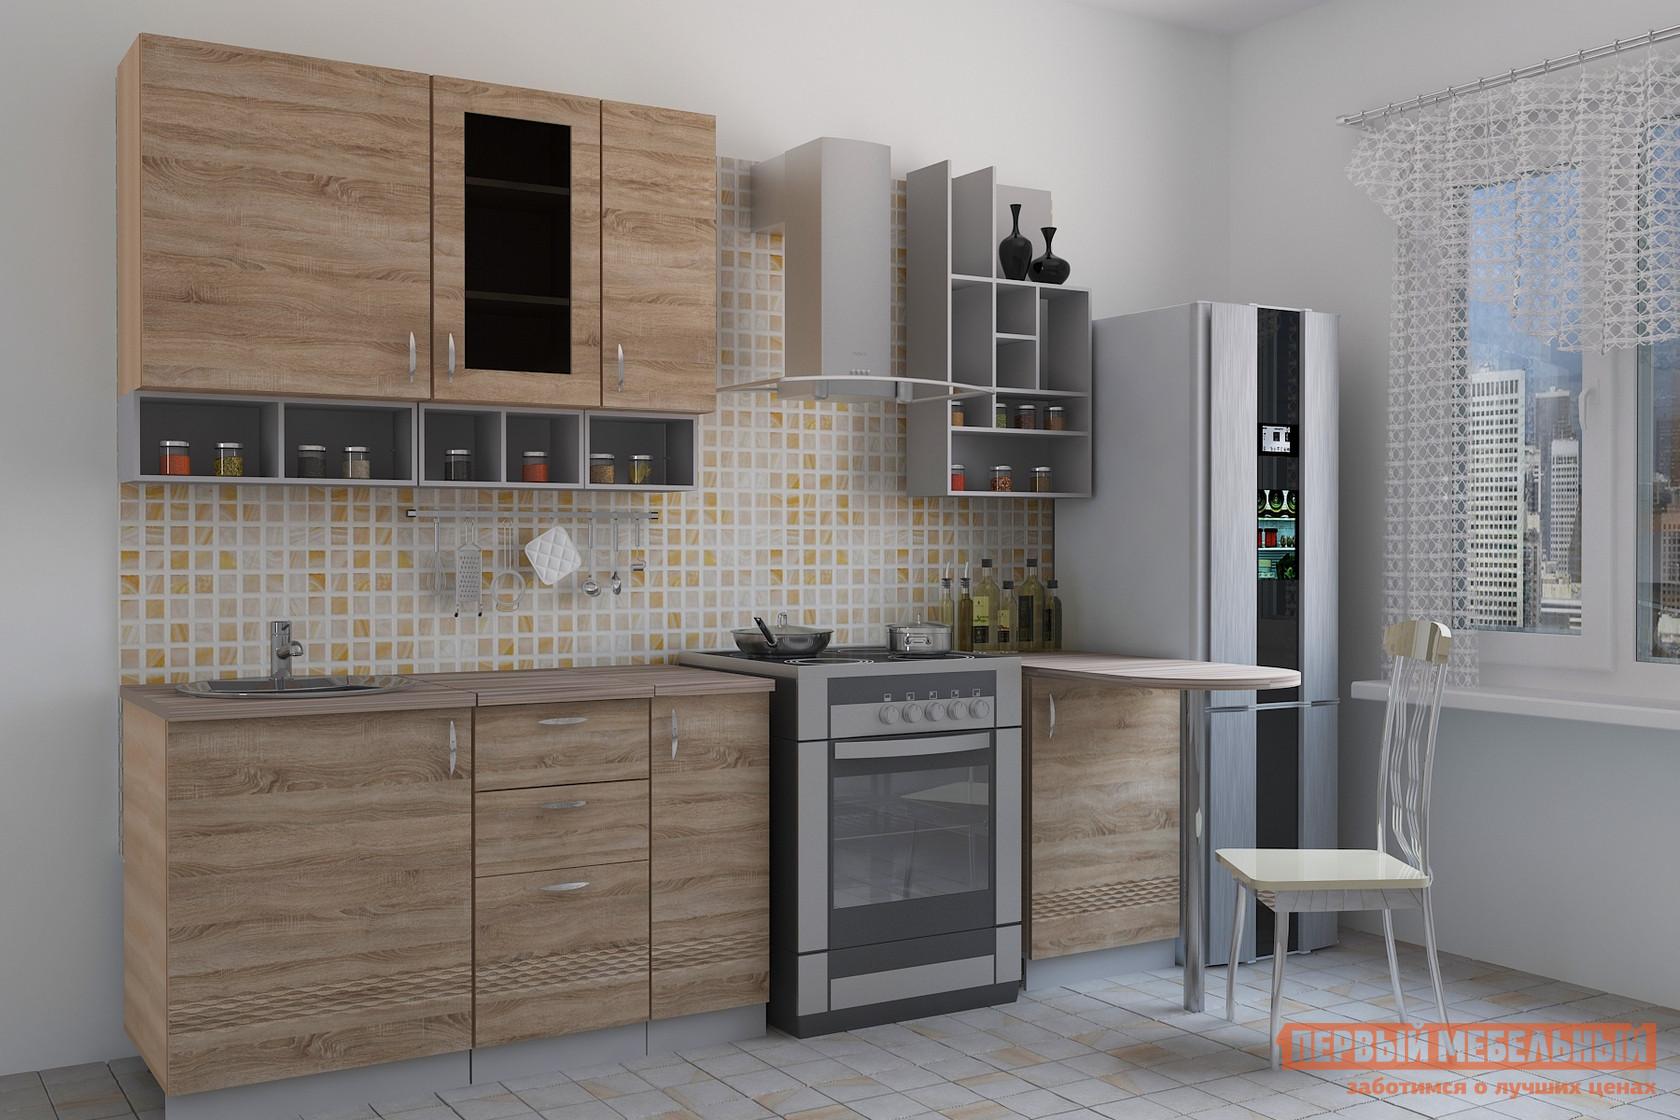 Кухонный гарнитур МО РОСТ Тоскана 6 (sesto) кухонный гарнитур трия фэнтези 120 см